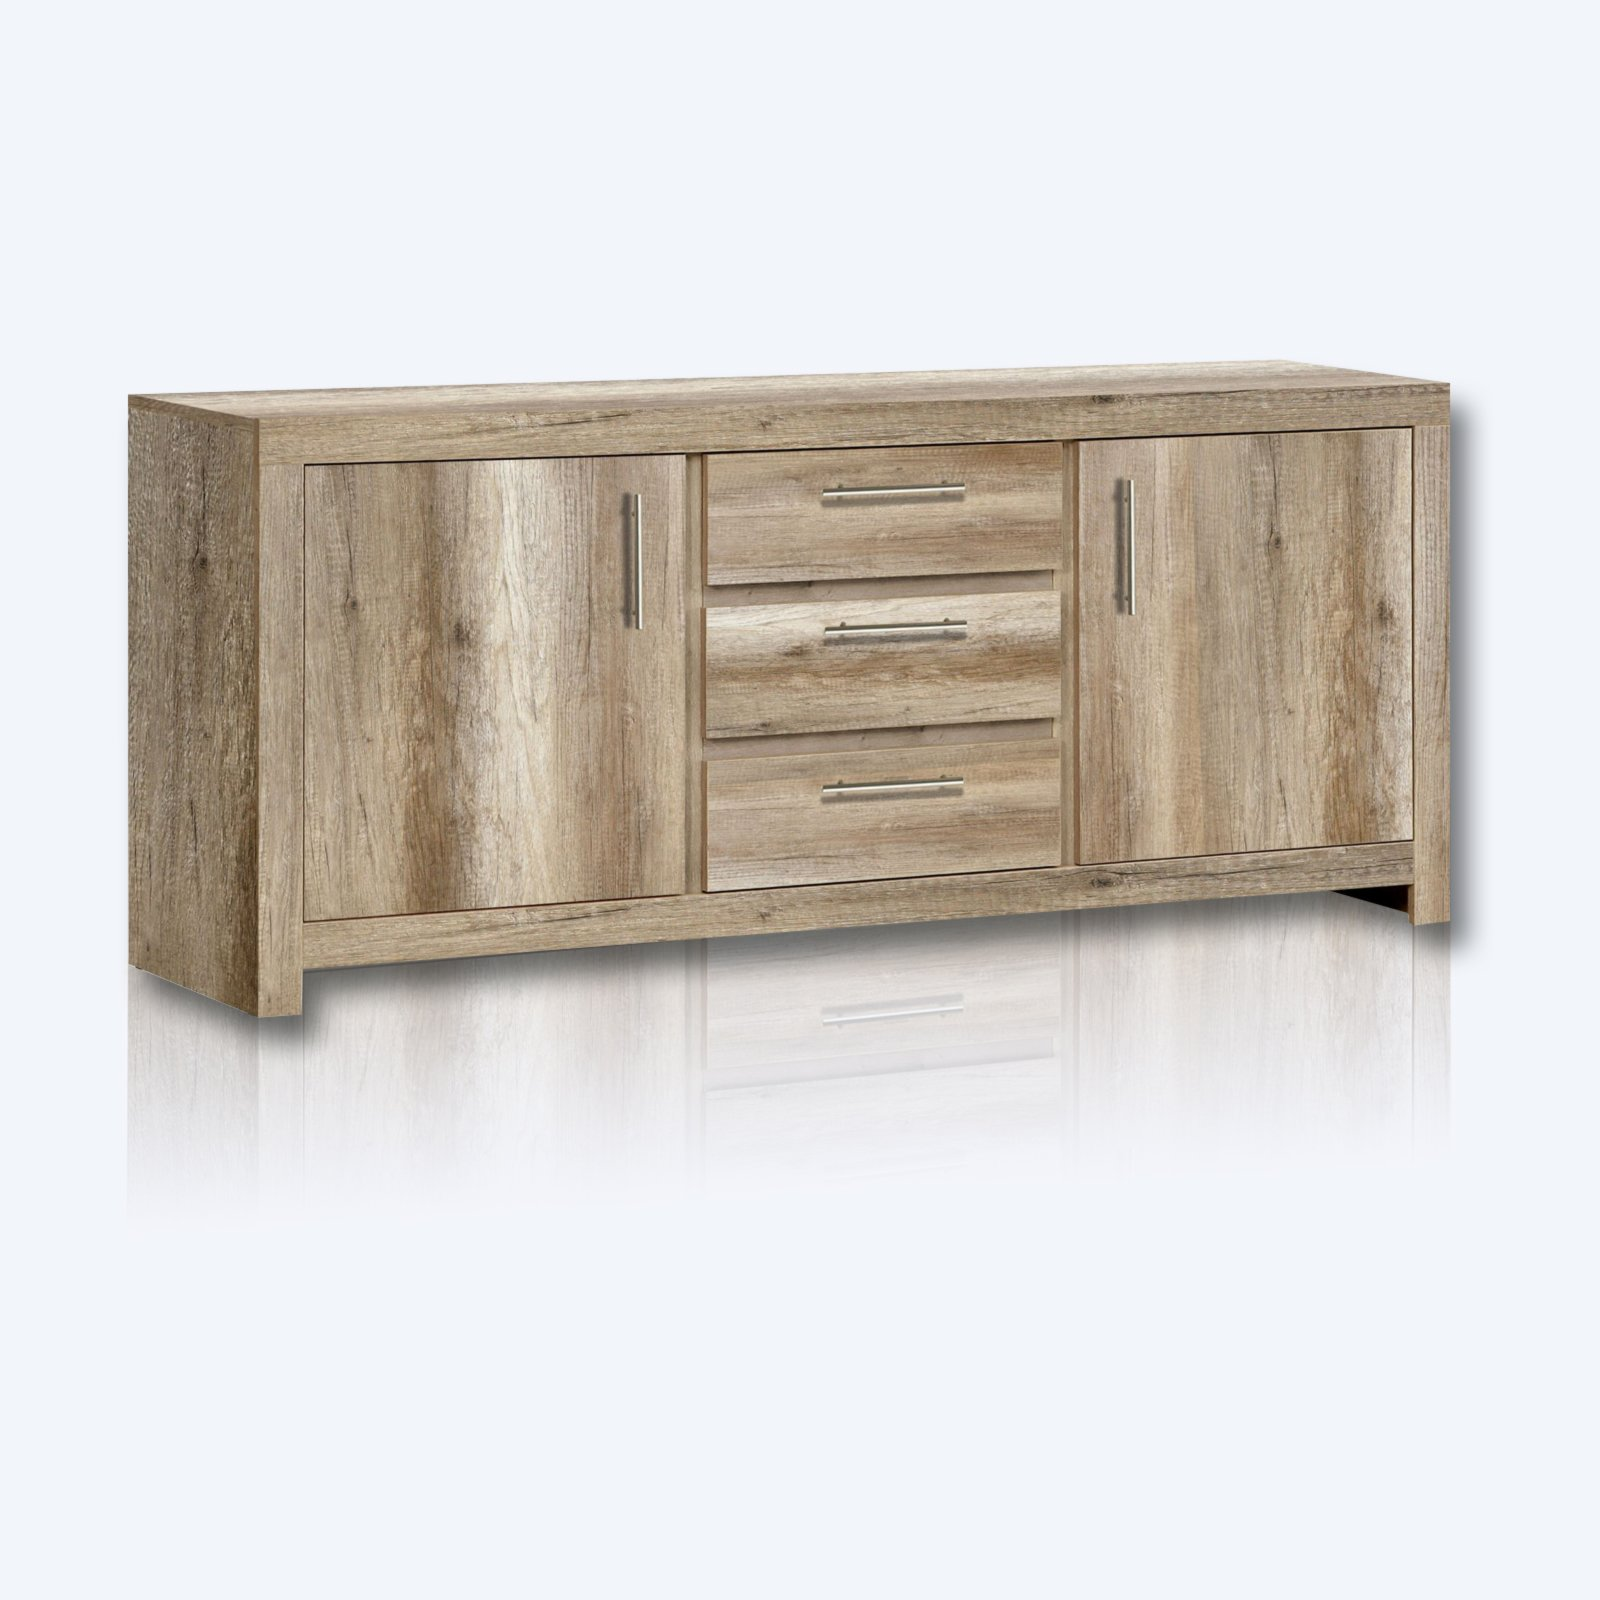 kommode imola eiche antik 166 cm breite kommoden sideboards m bel roller m belhaus. Black Bedroom Furniture Sets. Home Design Ideas